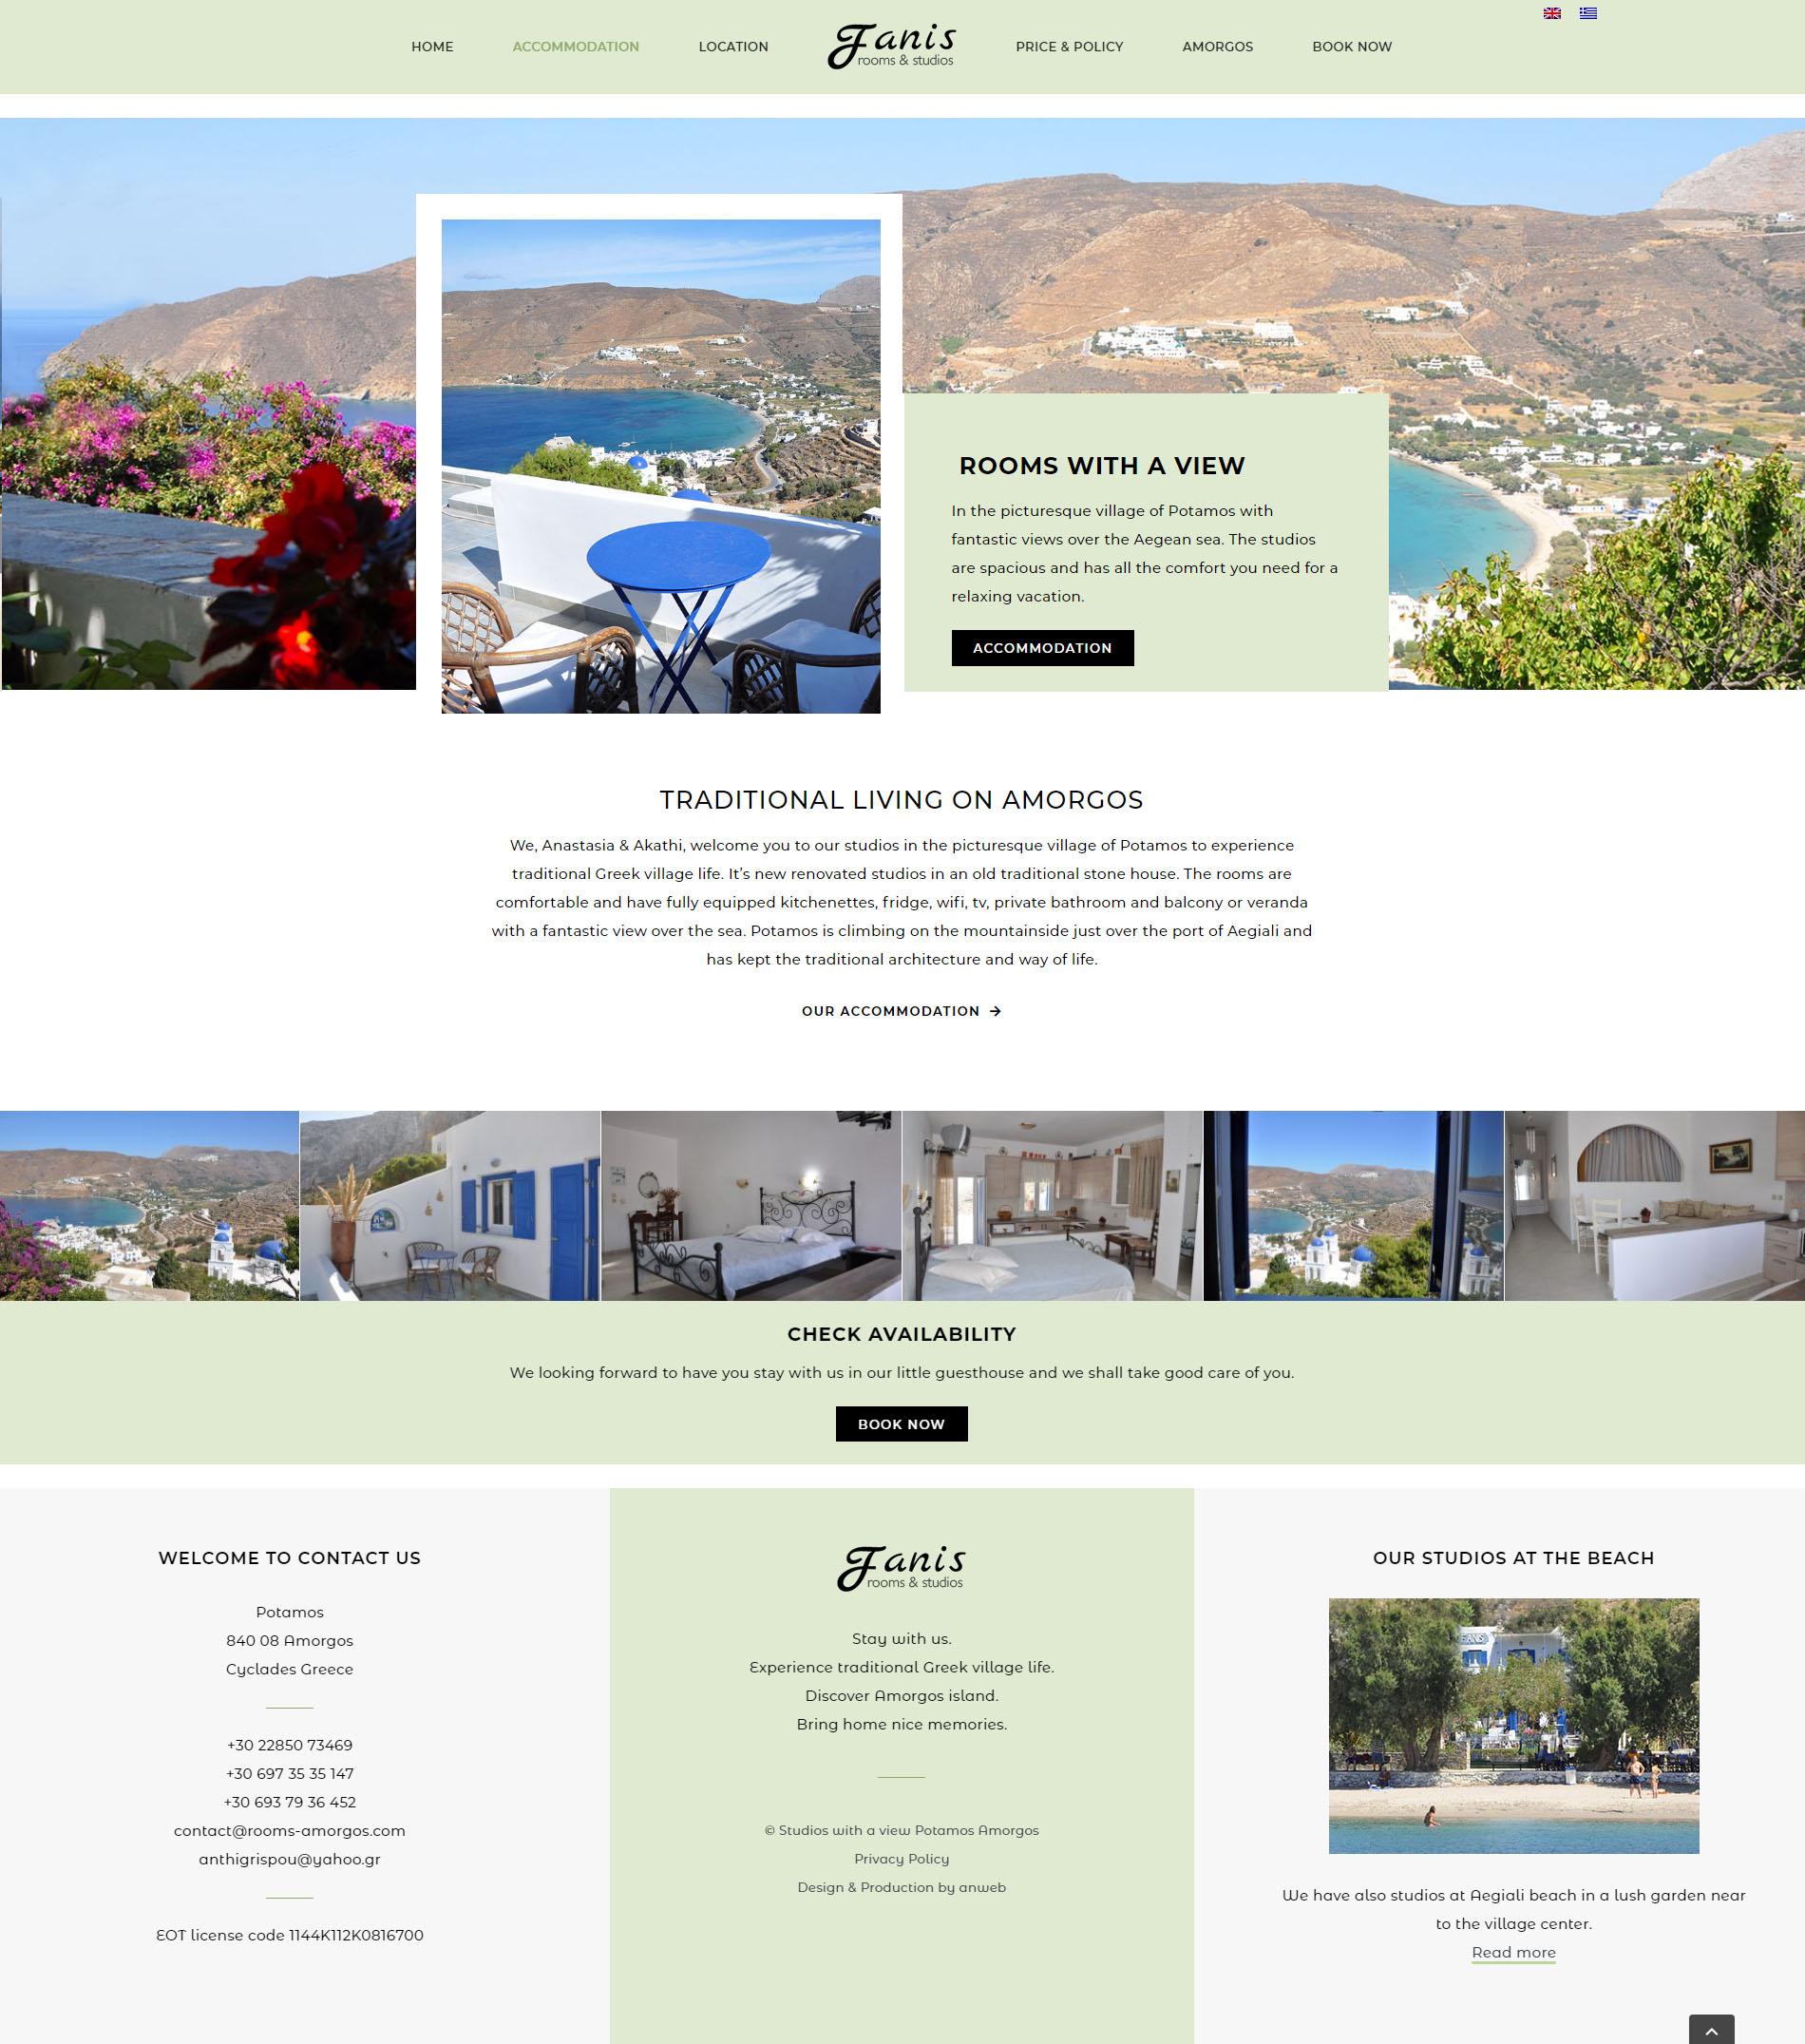 Web Design anweb Rooms with views Amorgos